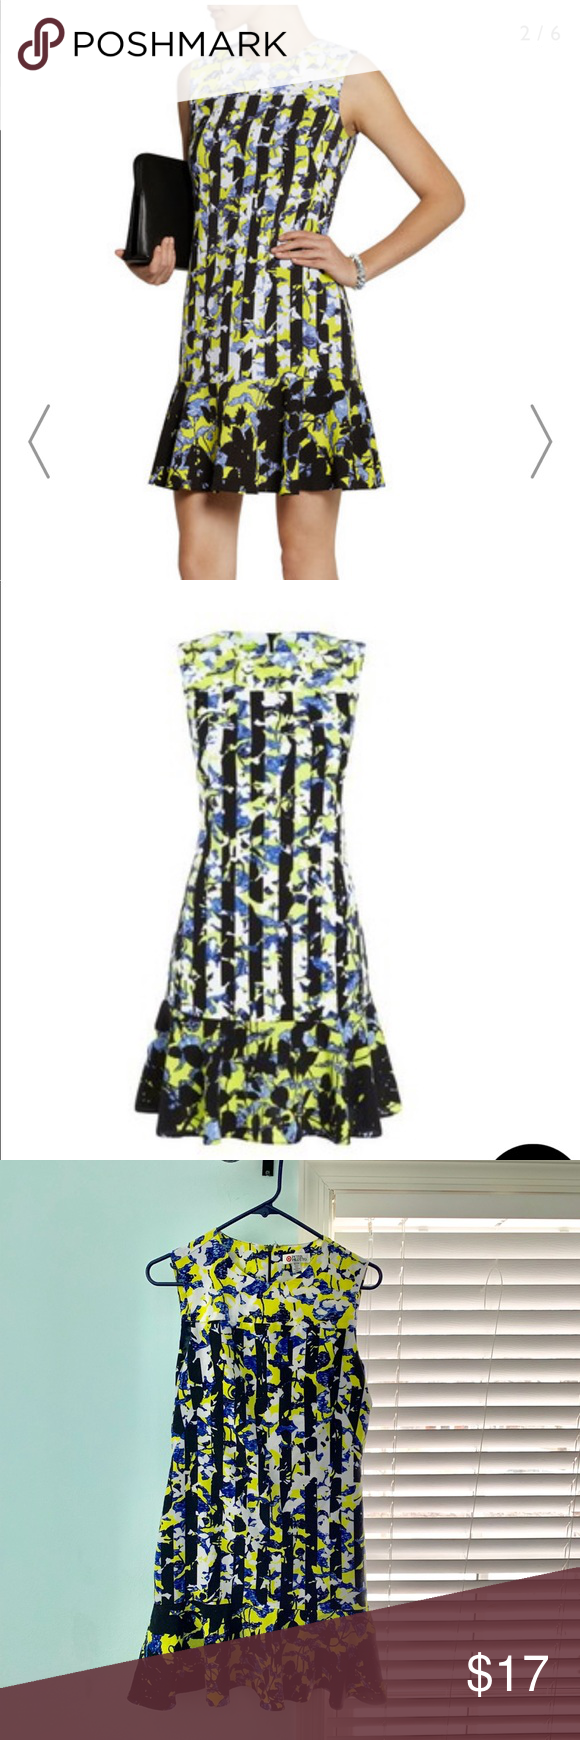 Peter Pilotto For Target Green Floral Dress Green Floral Dress Floral Dress Dresses [ 1740 x 580 Pixel ]